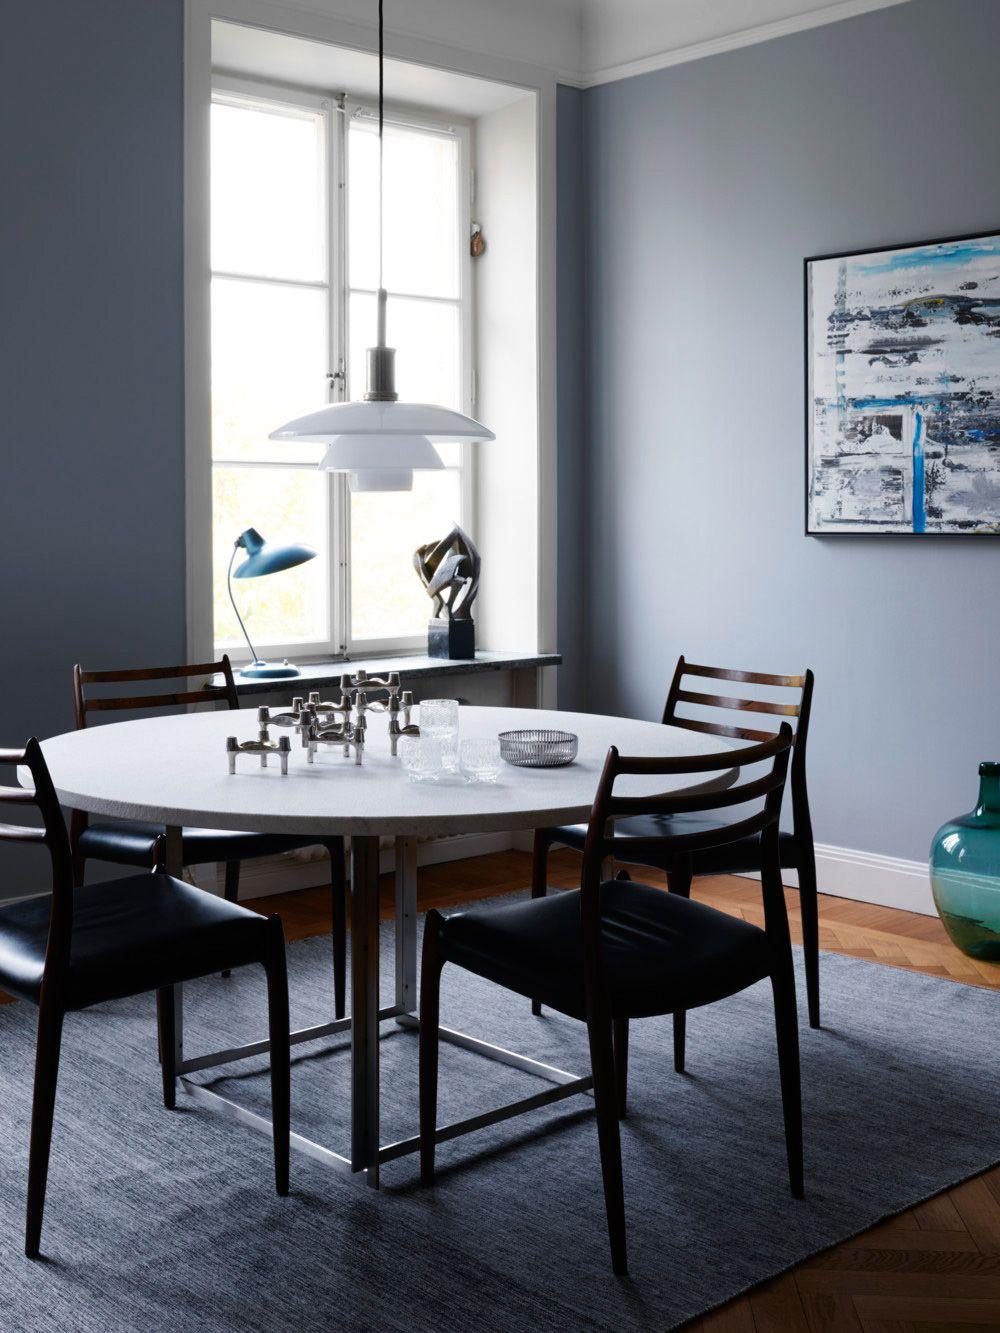 Take A Peek Into A Beautiful Home Filled With Scandinavian Design